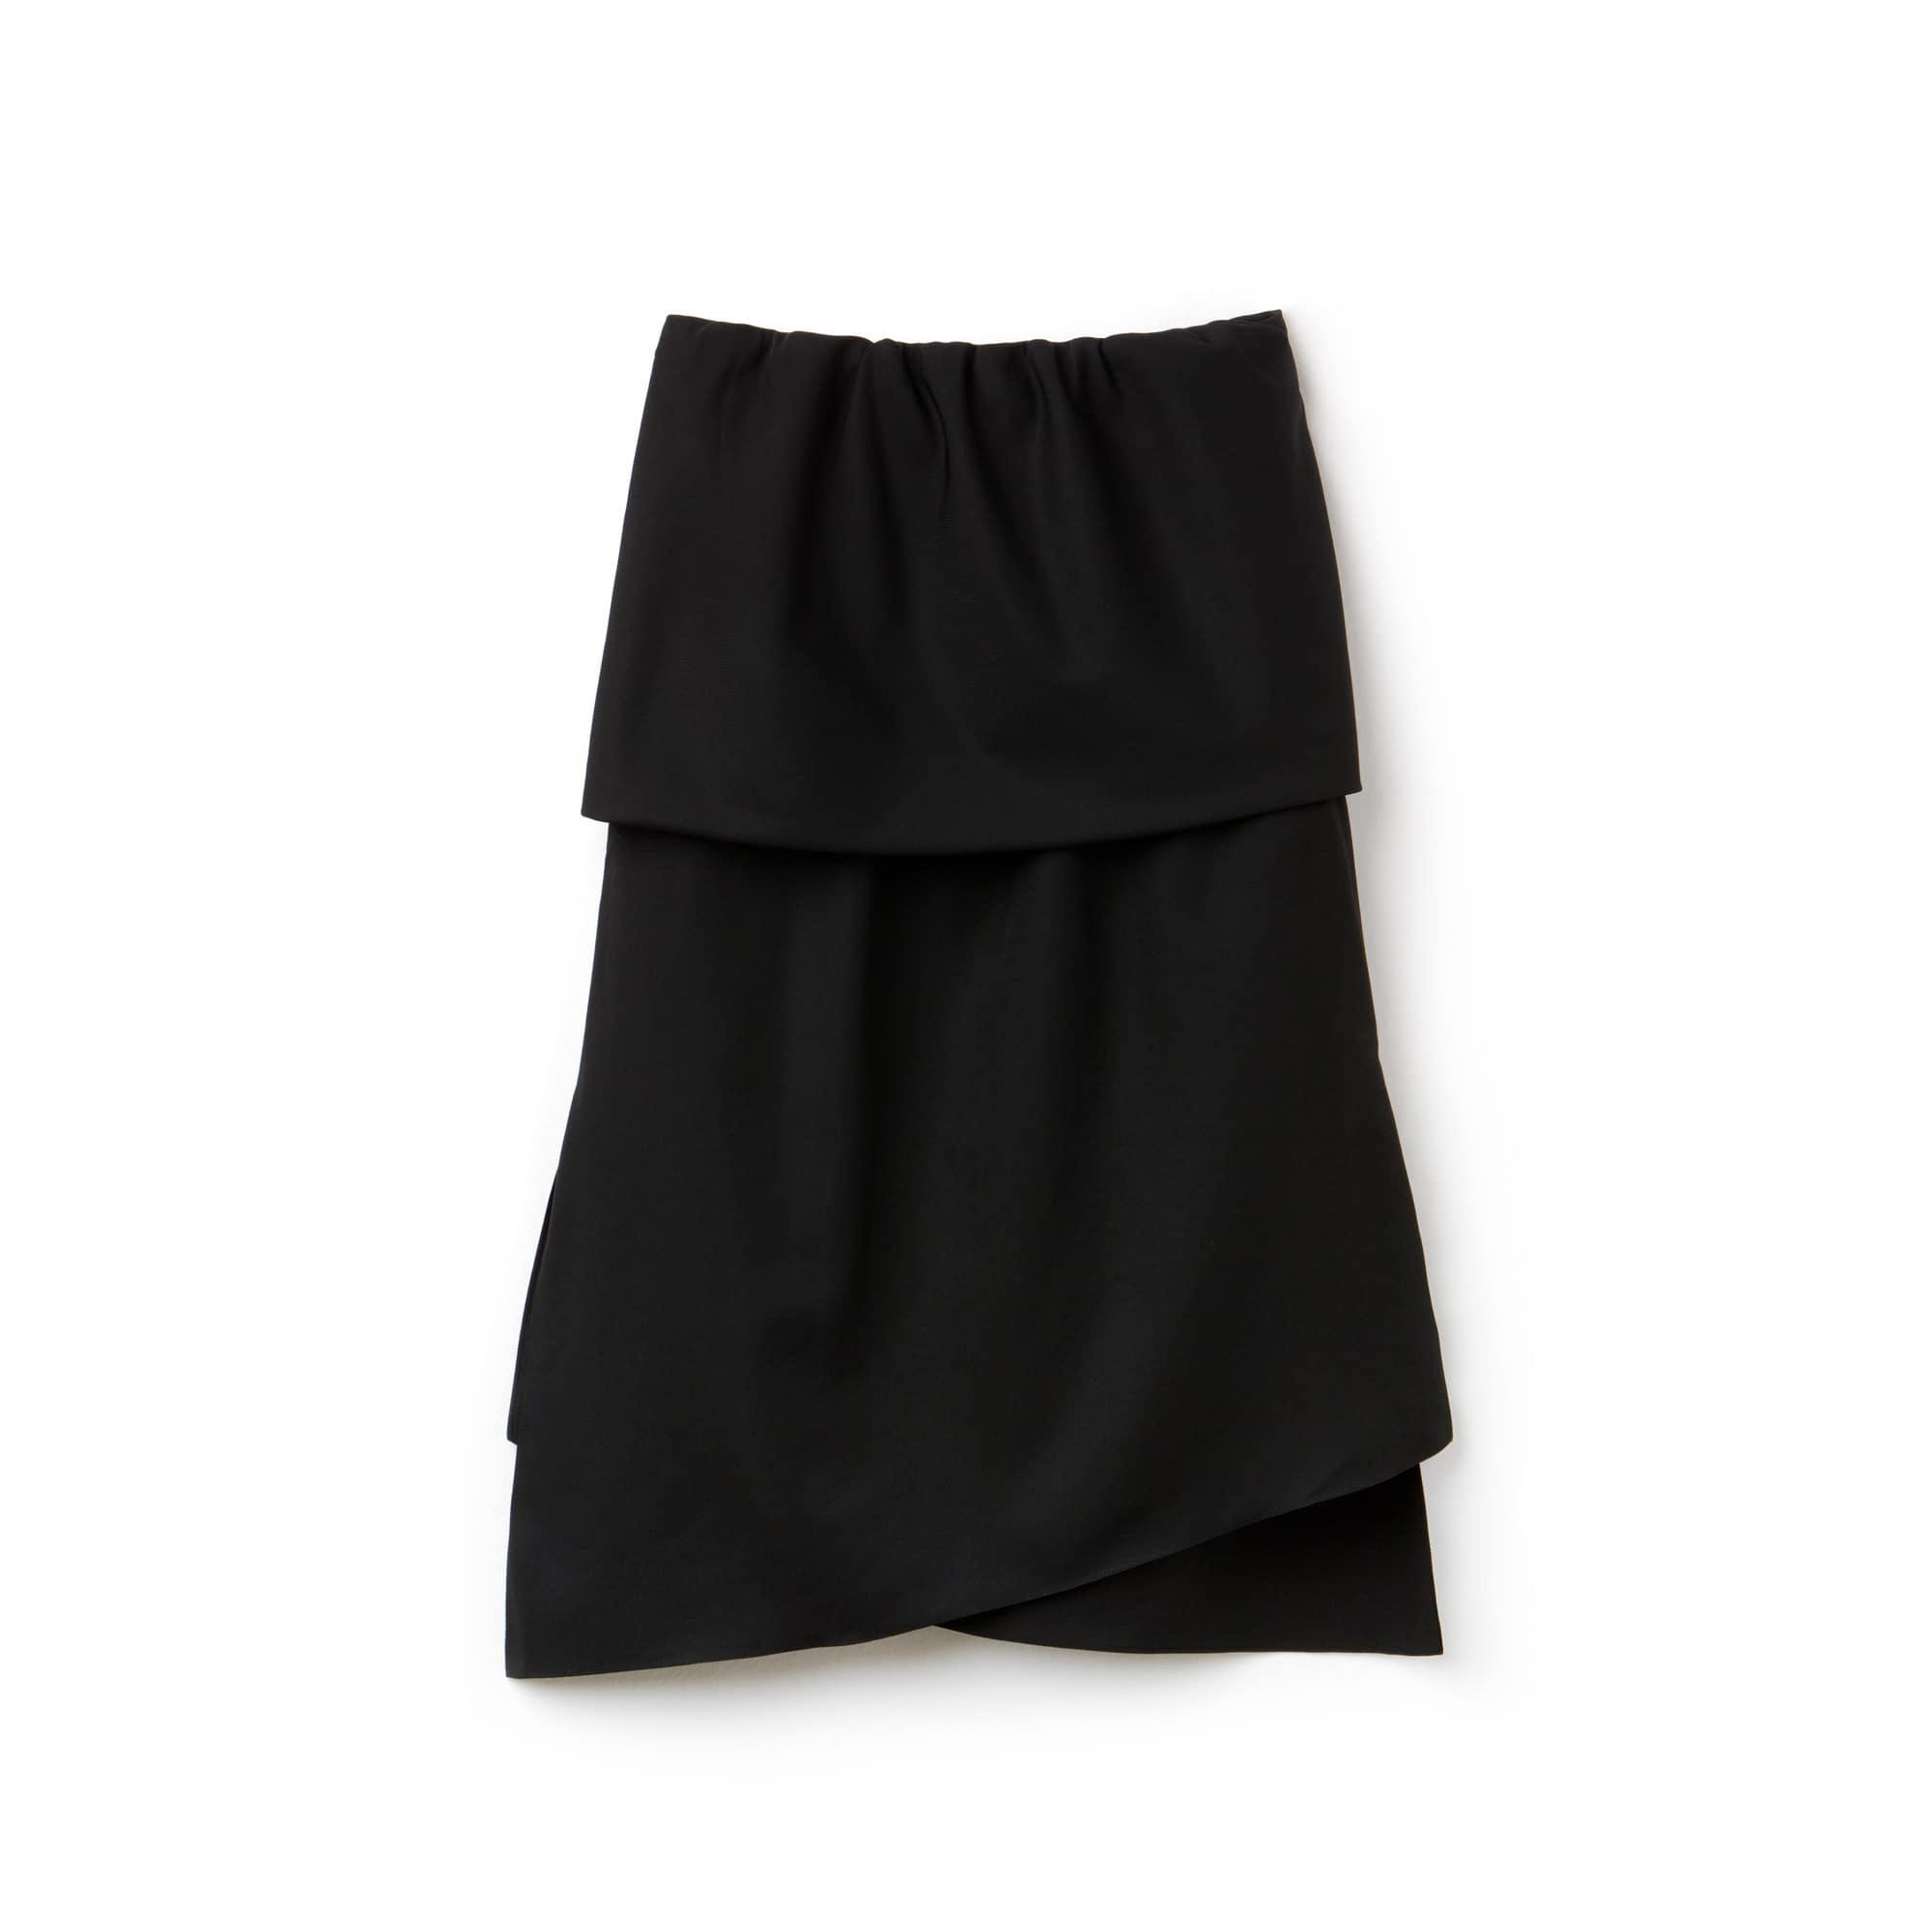 Women's Fashion Show Asymmetrical Twisted Tech Taffeta Skirt